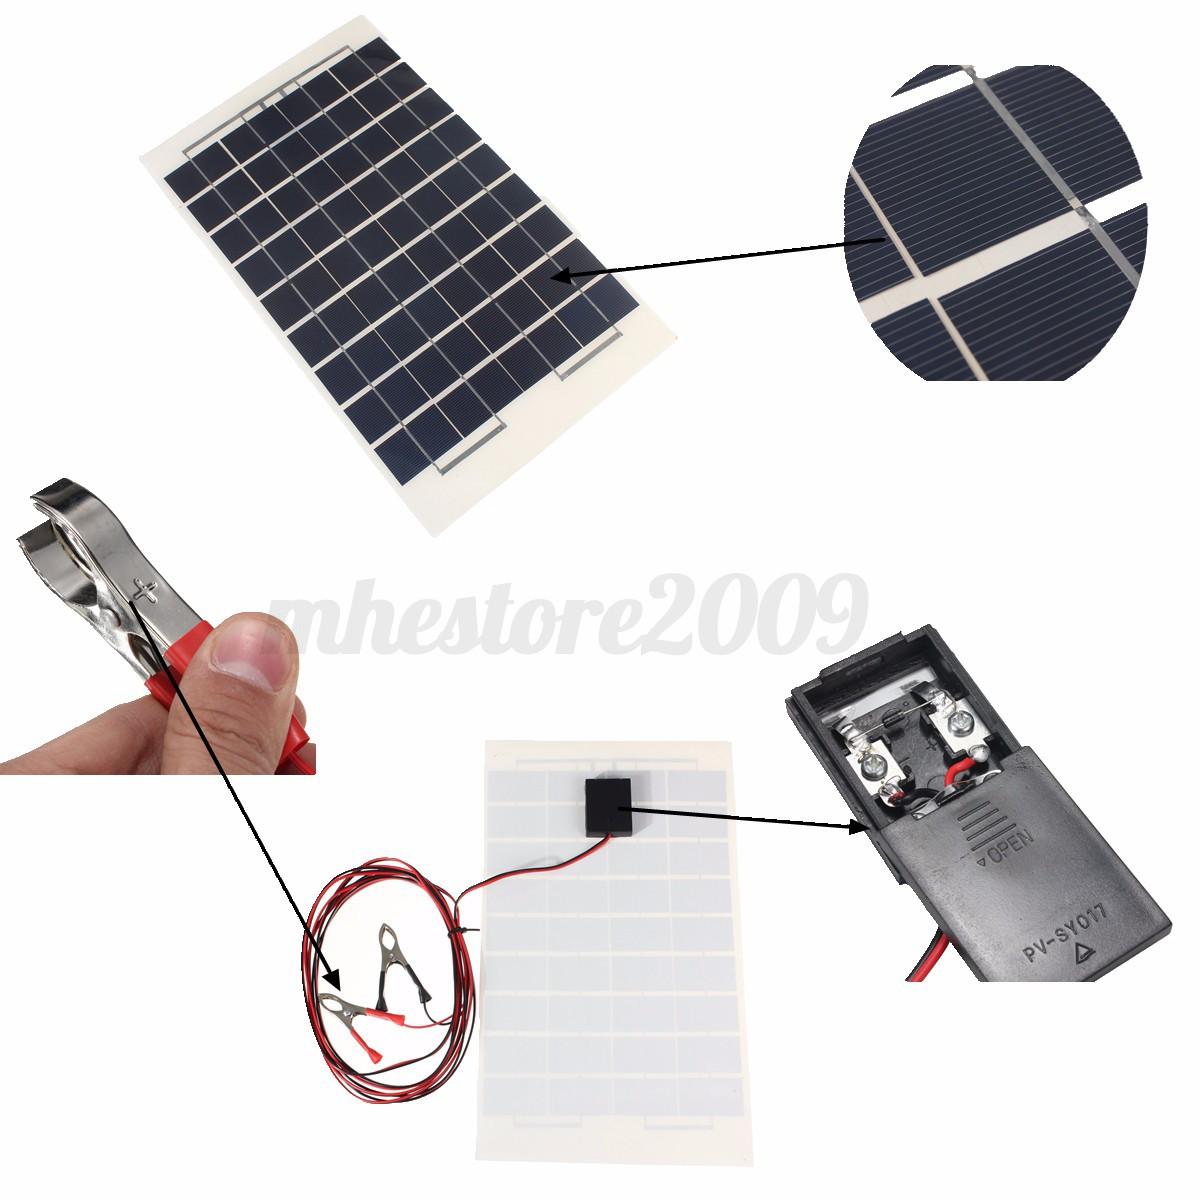 elfeland 10w 12v cell solar panel module battery charger. Black Bedroom Furniture Sets. Home Design Ideas